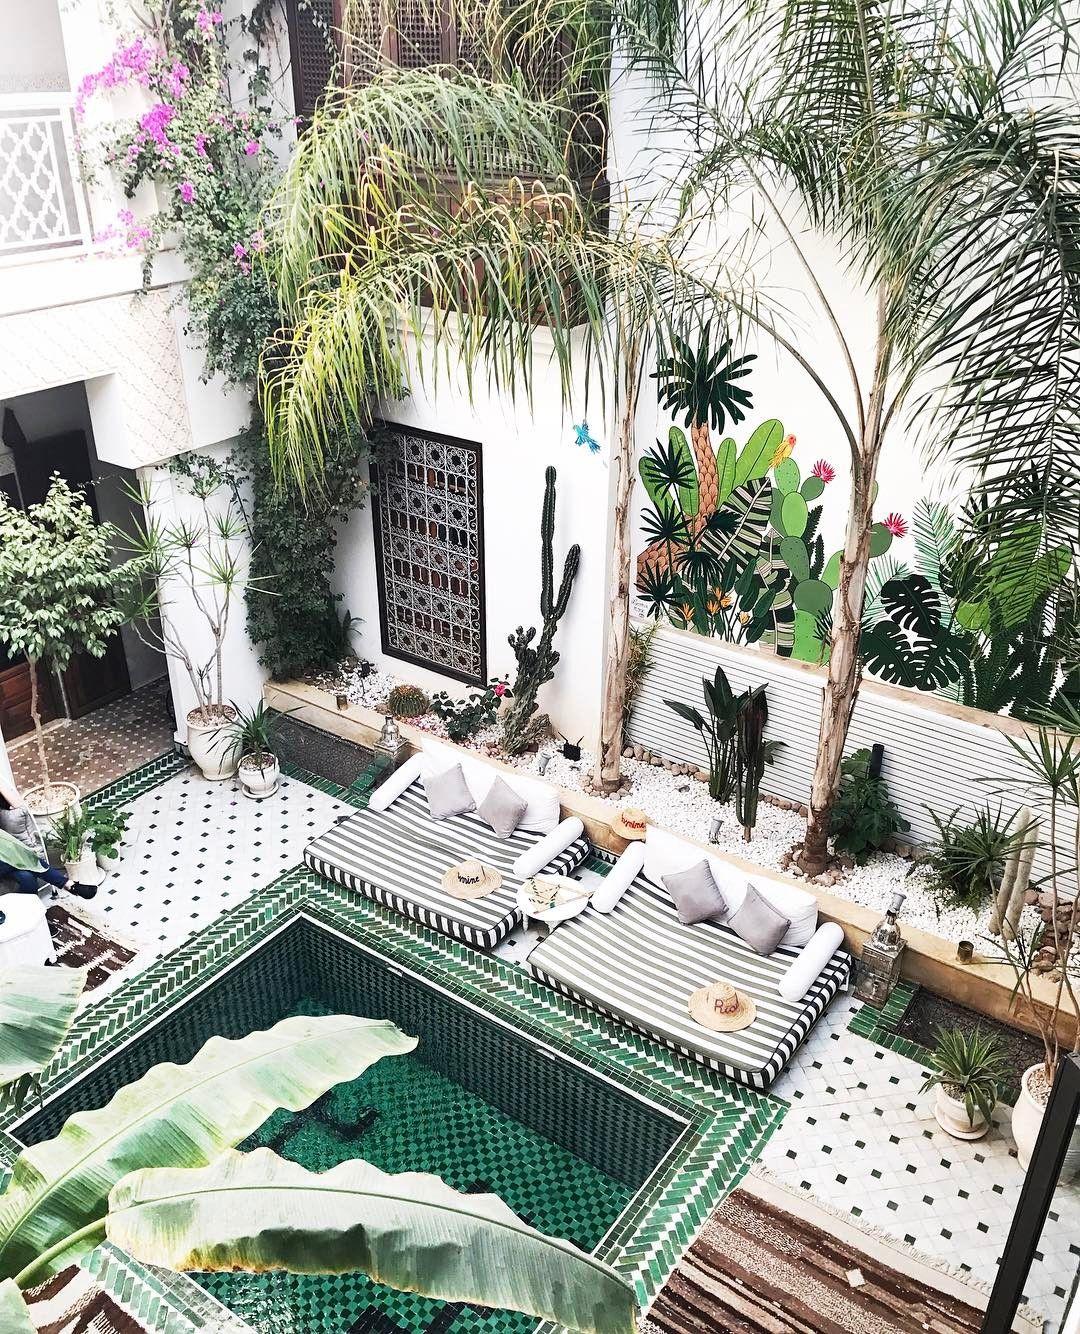 Le Riad Yasmine Marrakech, Morocco | Le riad, Piscine et ...